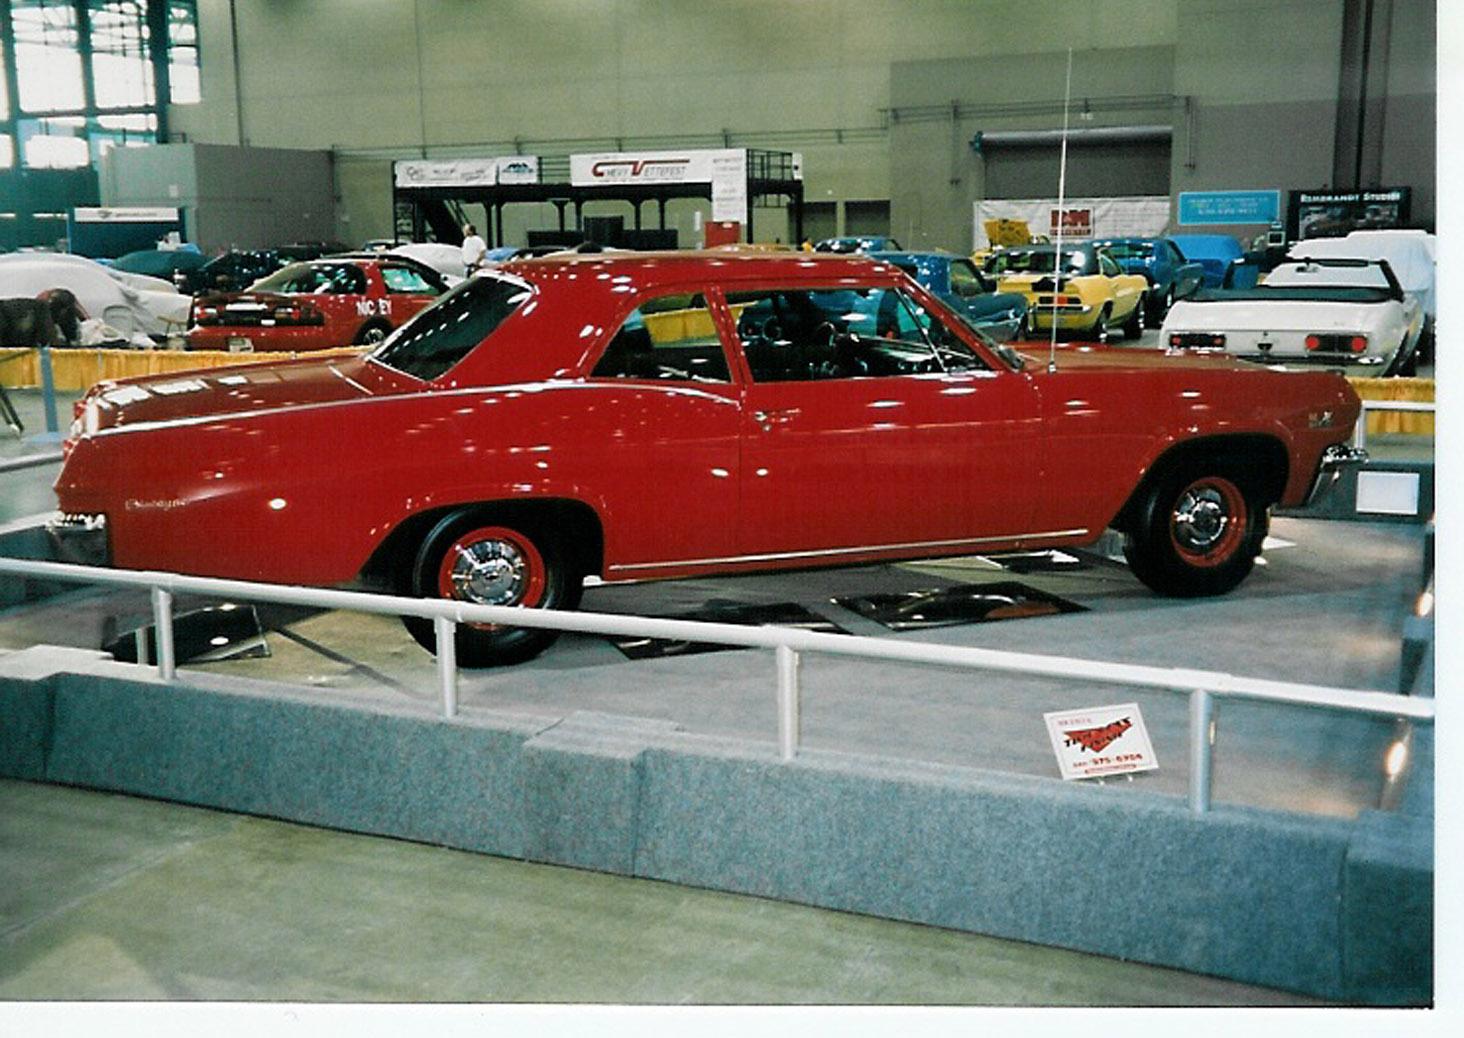 Beautiful Classic Car Value Guide Inspiration - Classic Cars Ideas ...